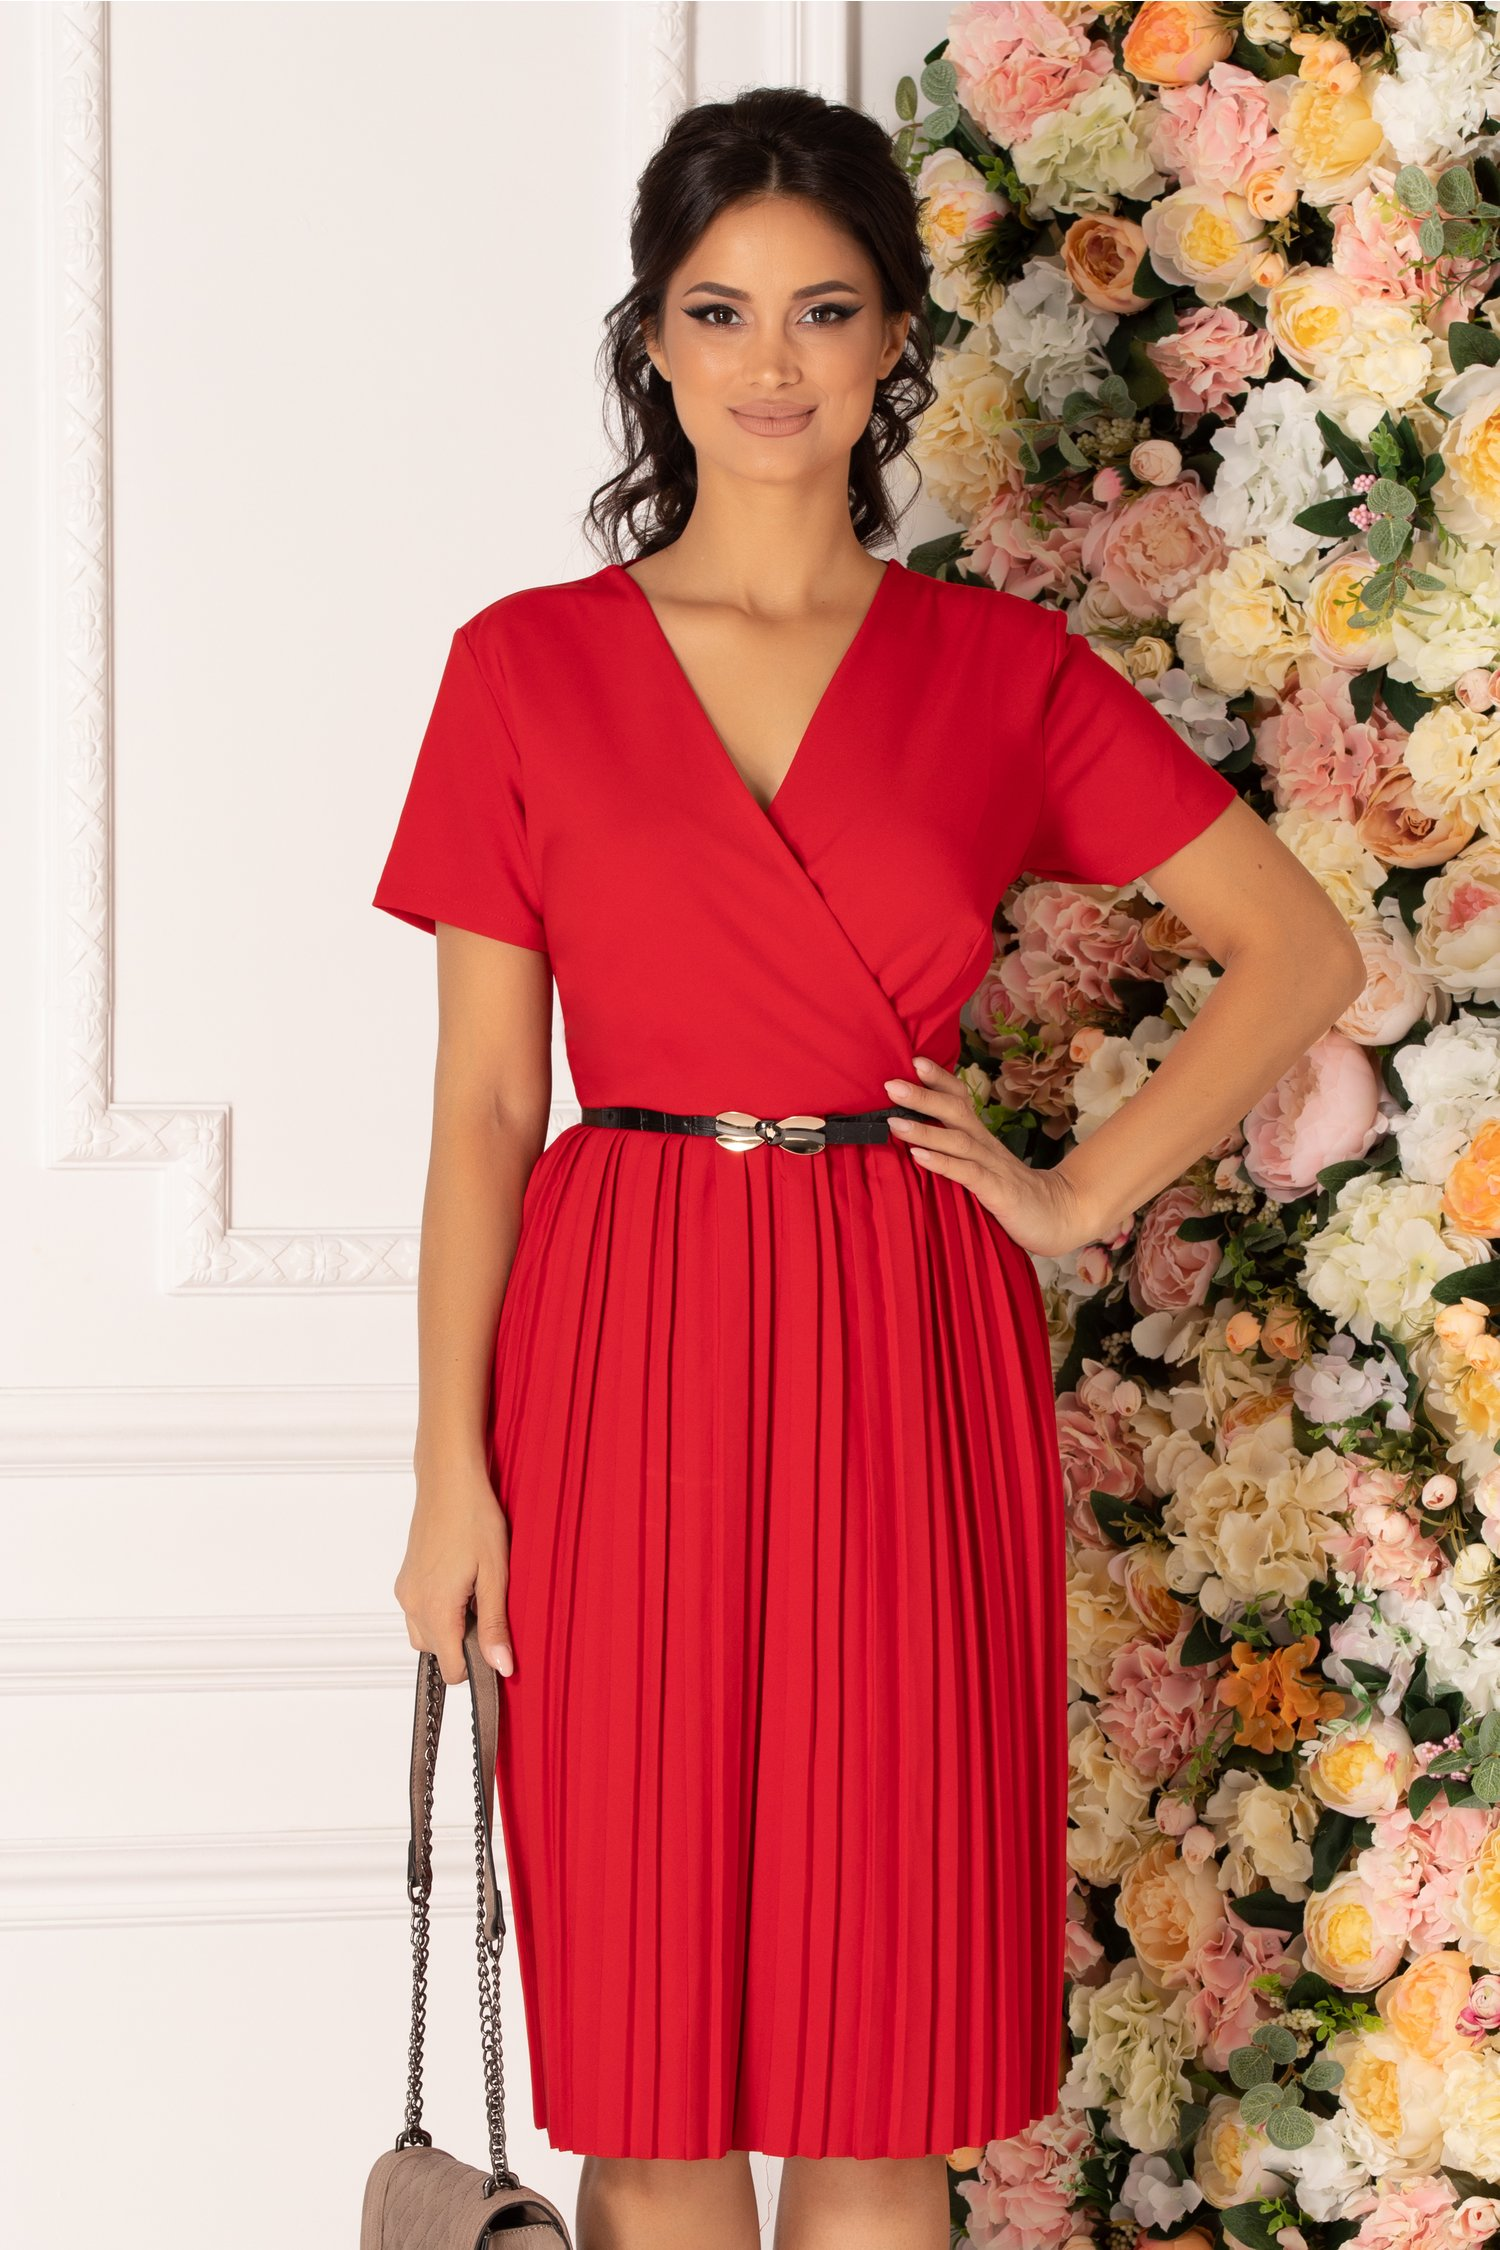 Rochie Carolina rosie cu fusta plisata